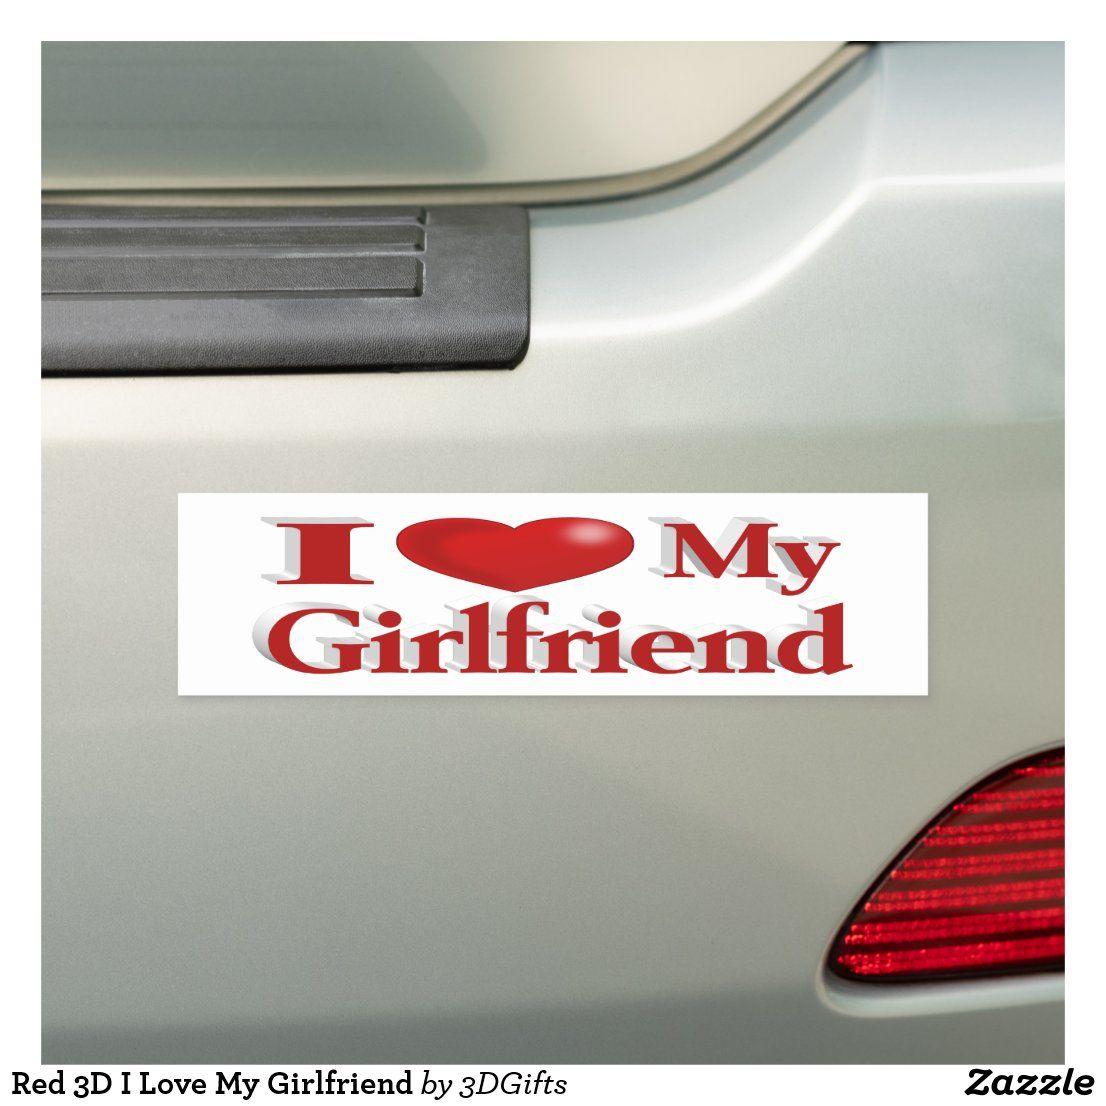 I Love My Girlfriend Car Magnet Zazzle Com I Love My Girlfriend Me As A Girlfriend Car Magnets [ 1106 x 1106 Pixel ]